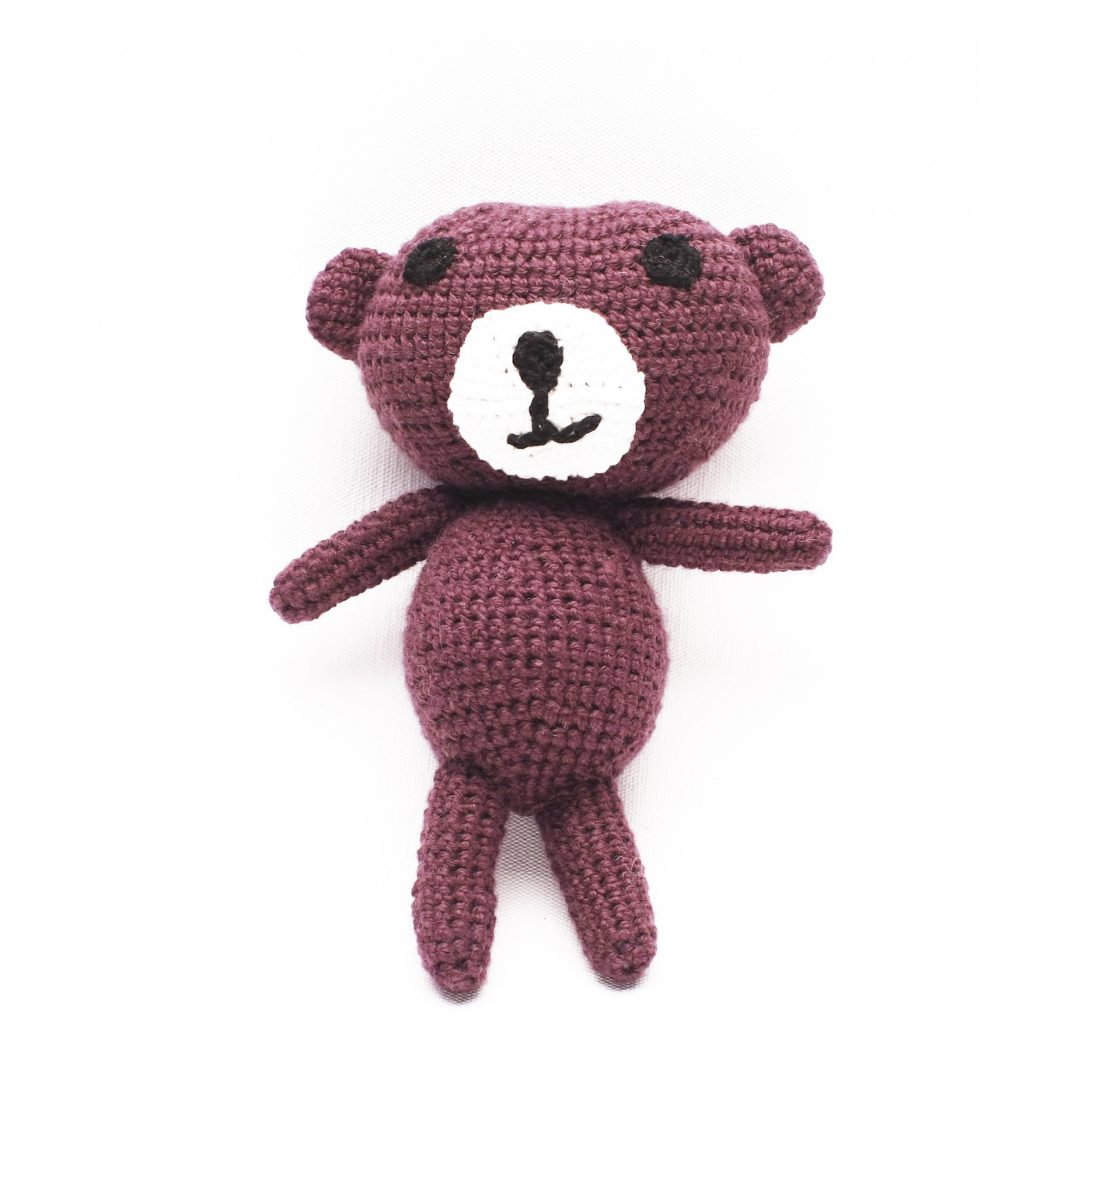 AMIGURUMI TEDDY BEAR WITH THE RATTLE 1055